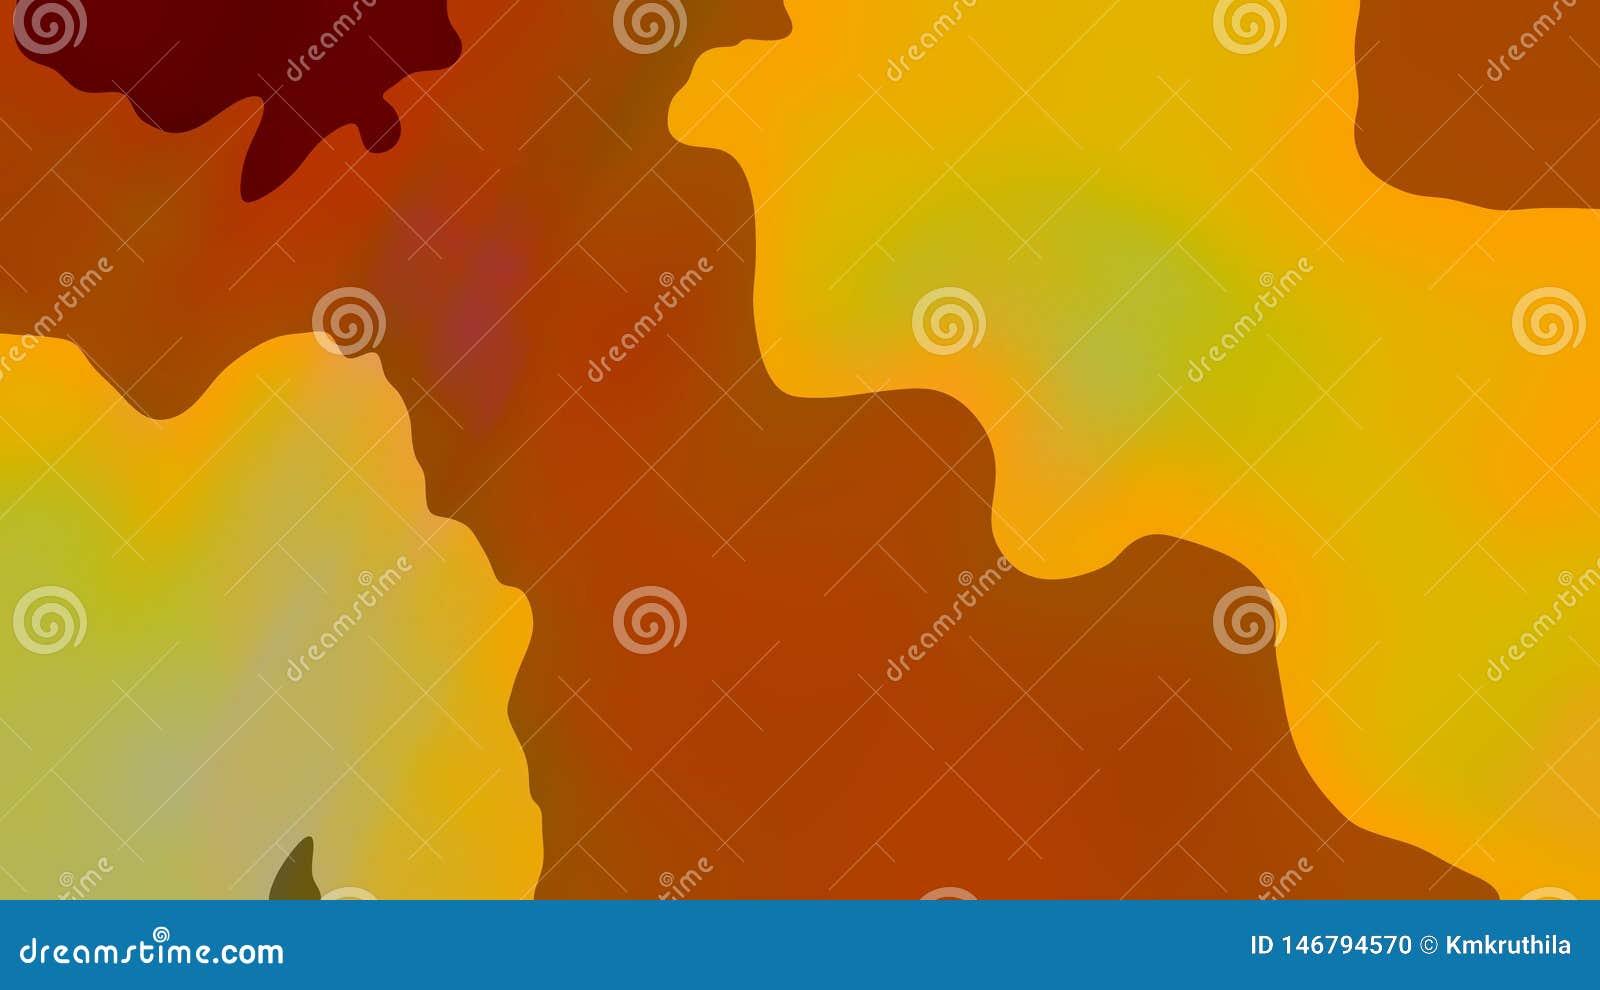 Yellow Orange Silhouette Background Beautiful elegant Illustration graphic art design Background